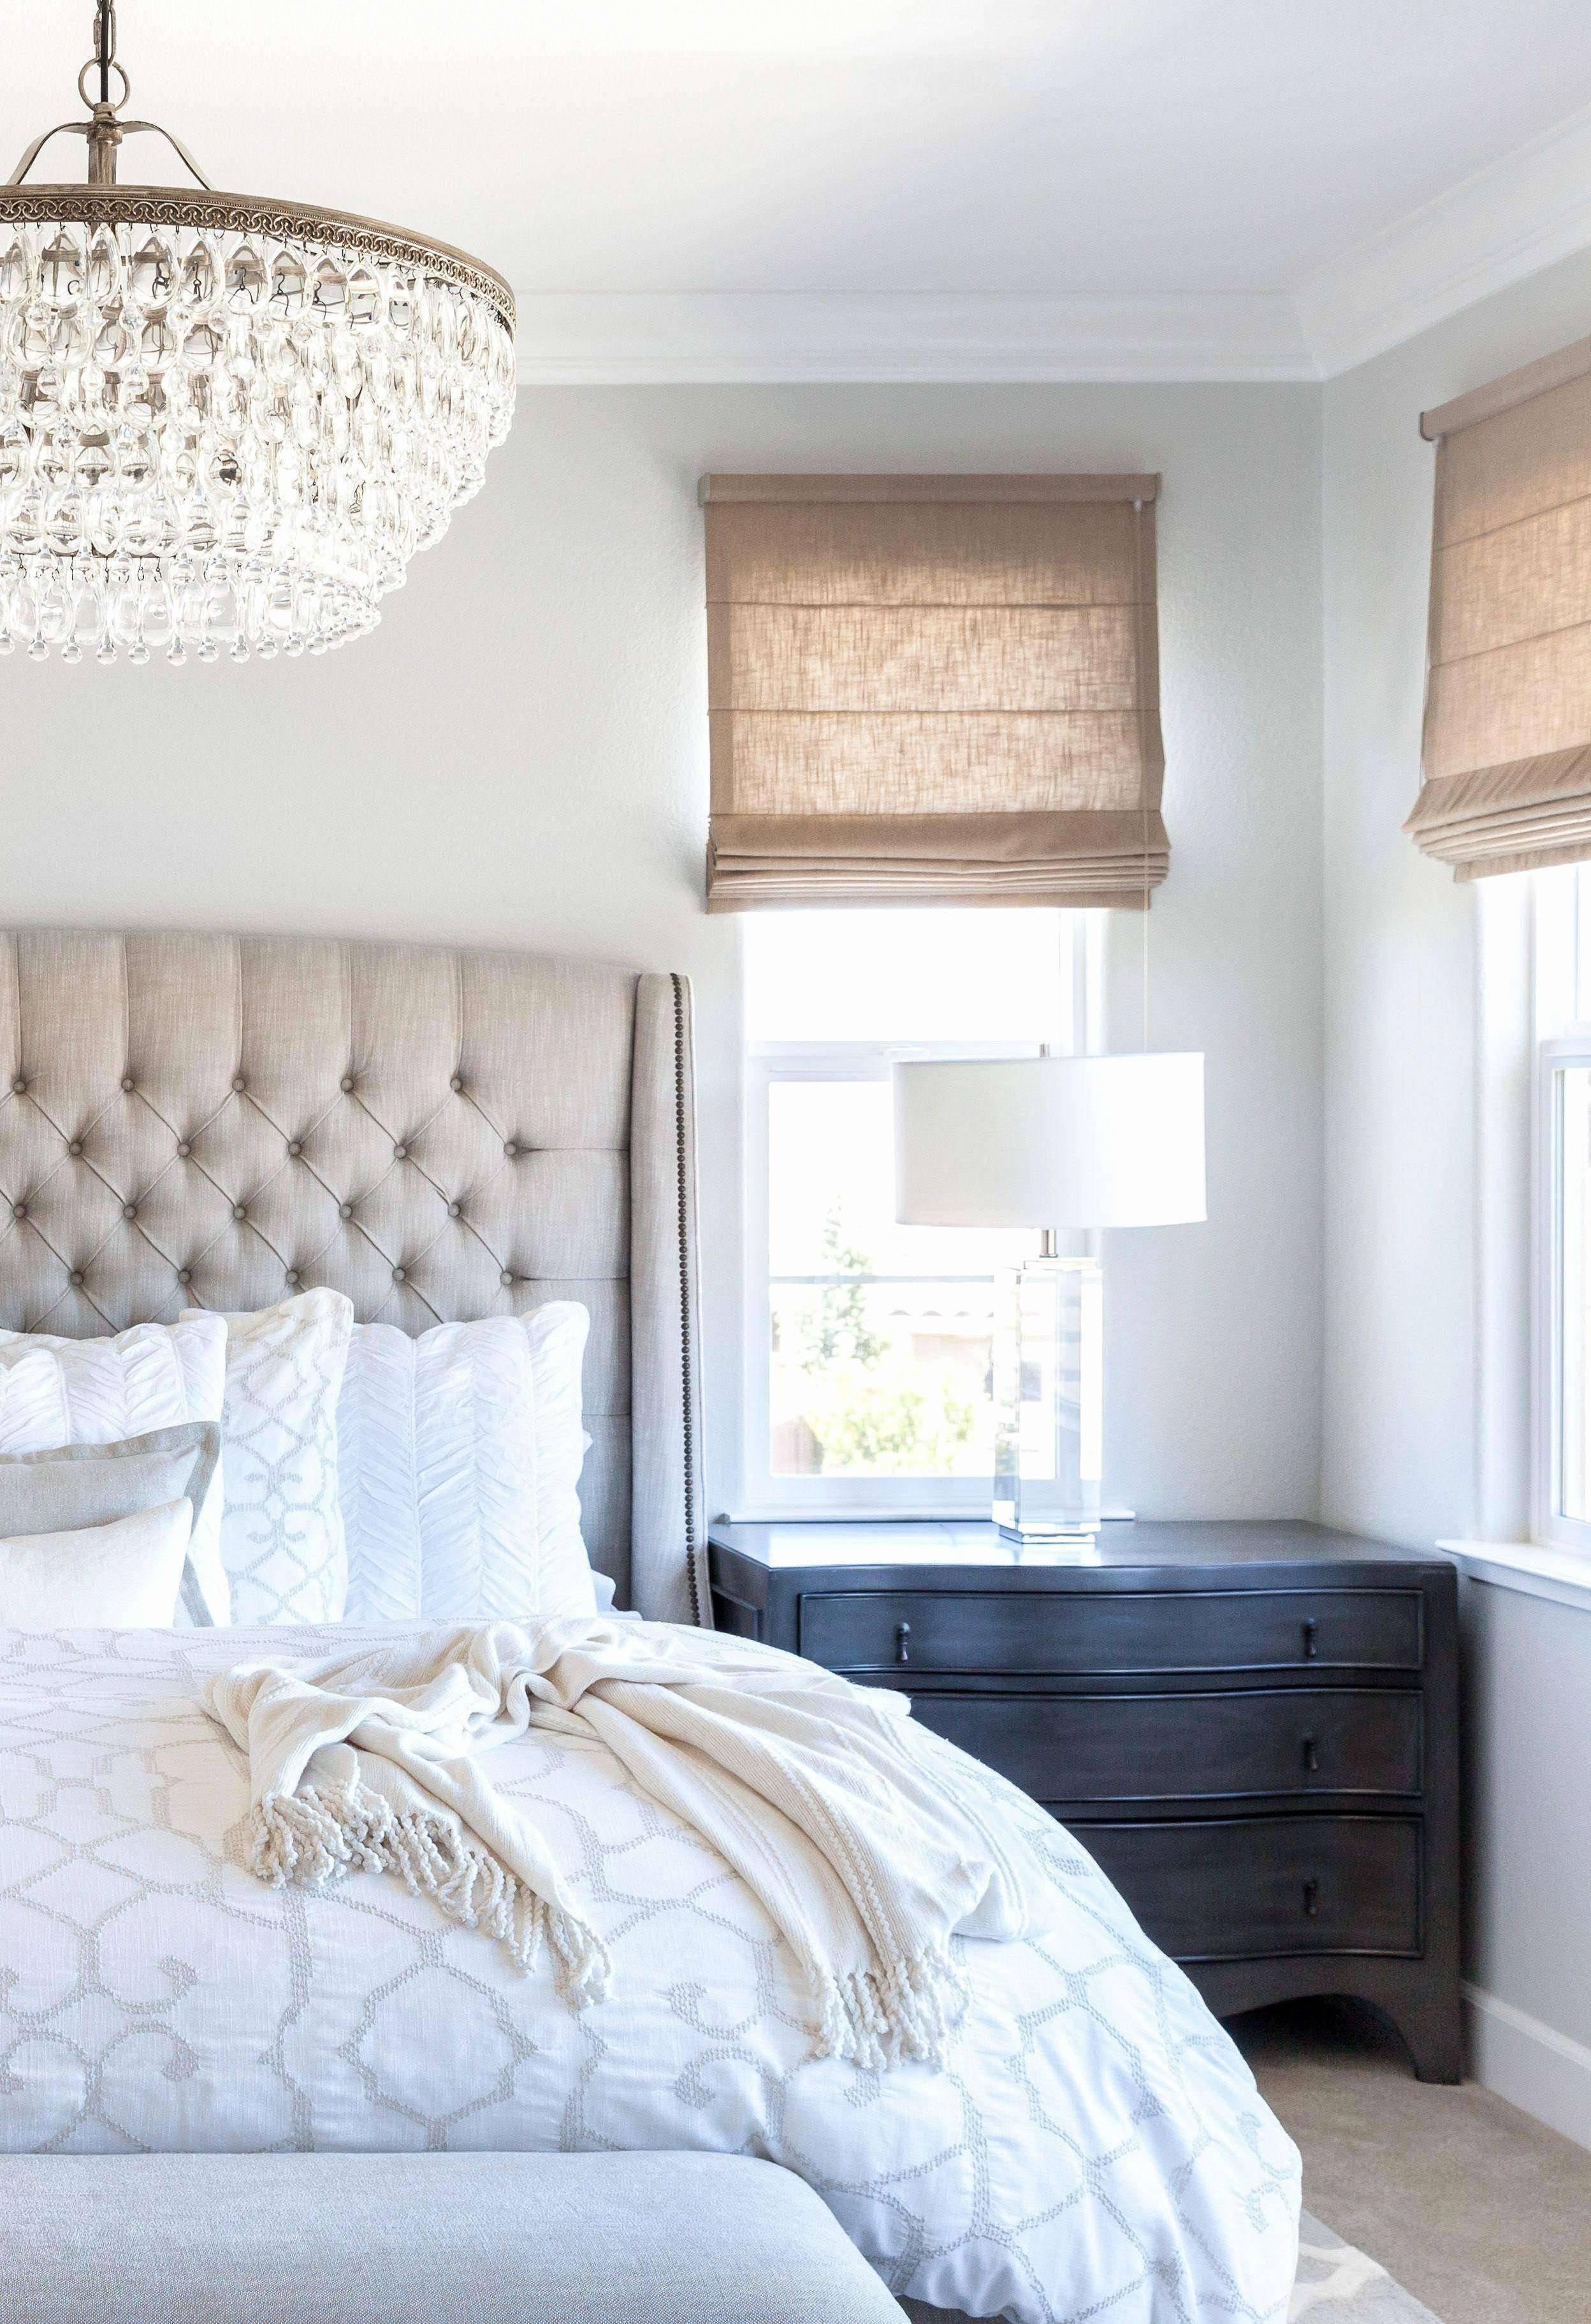 43 fresh master bedroom ideas for couples romantic interior design master bedroom bedding ideas master bedroom bedding ideas